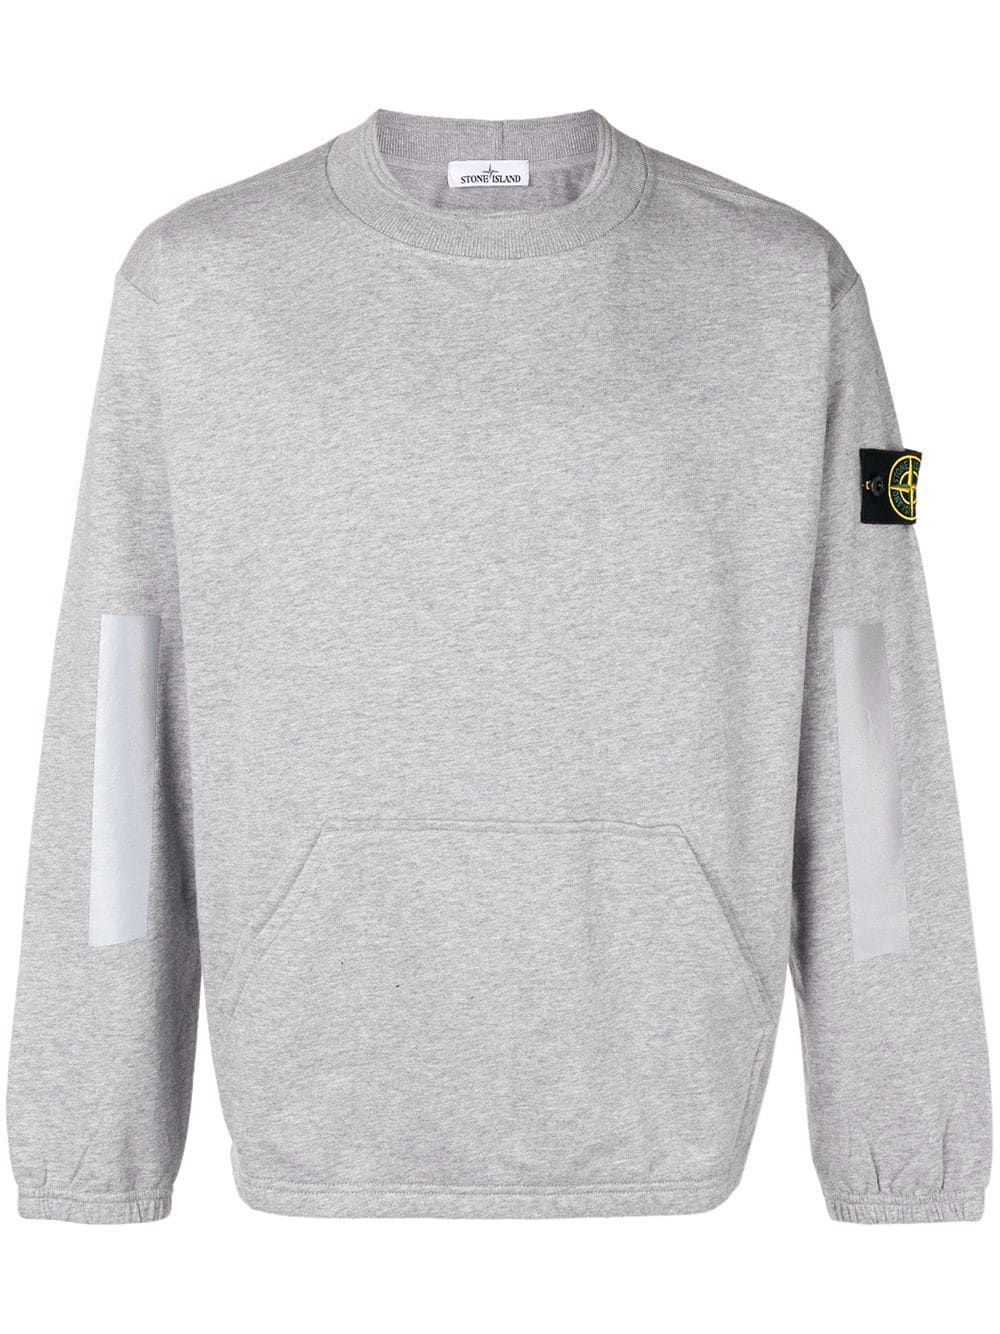 Stone Island Stone Island Basic Sweatshirt Grey Stoneisland Cloth Basic Sweatshirt Sweatshirts